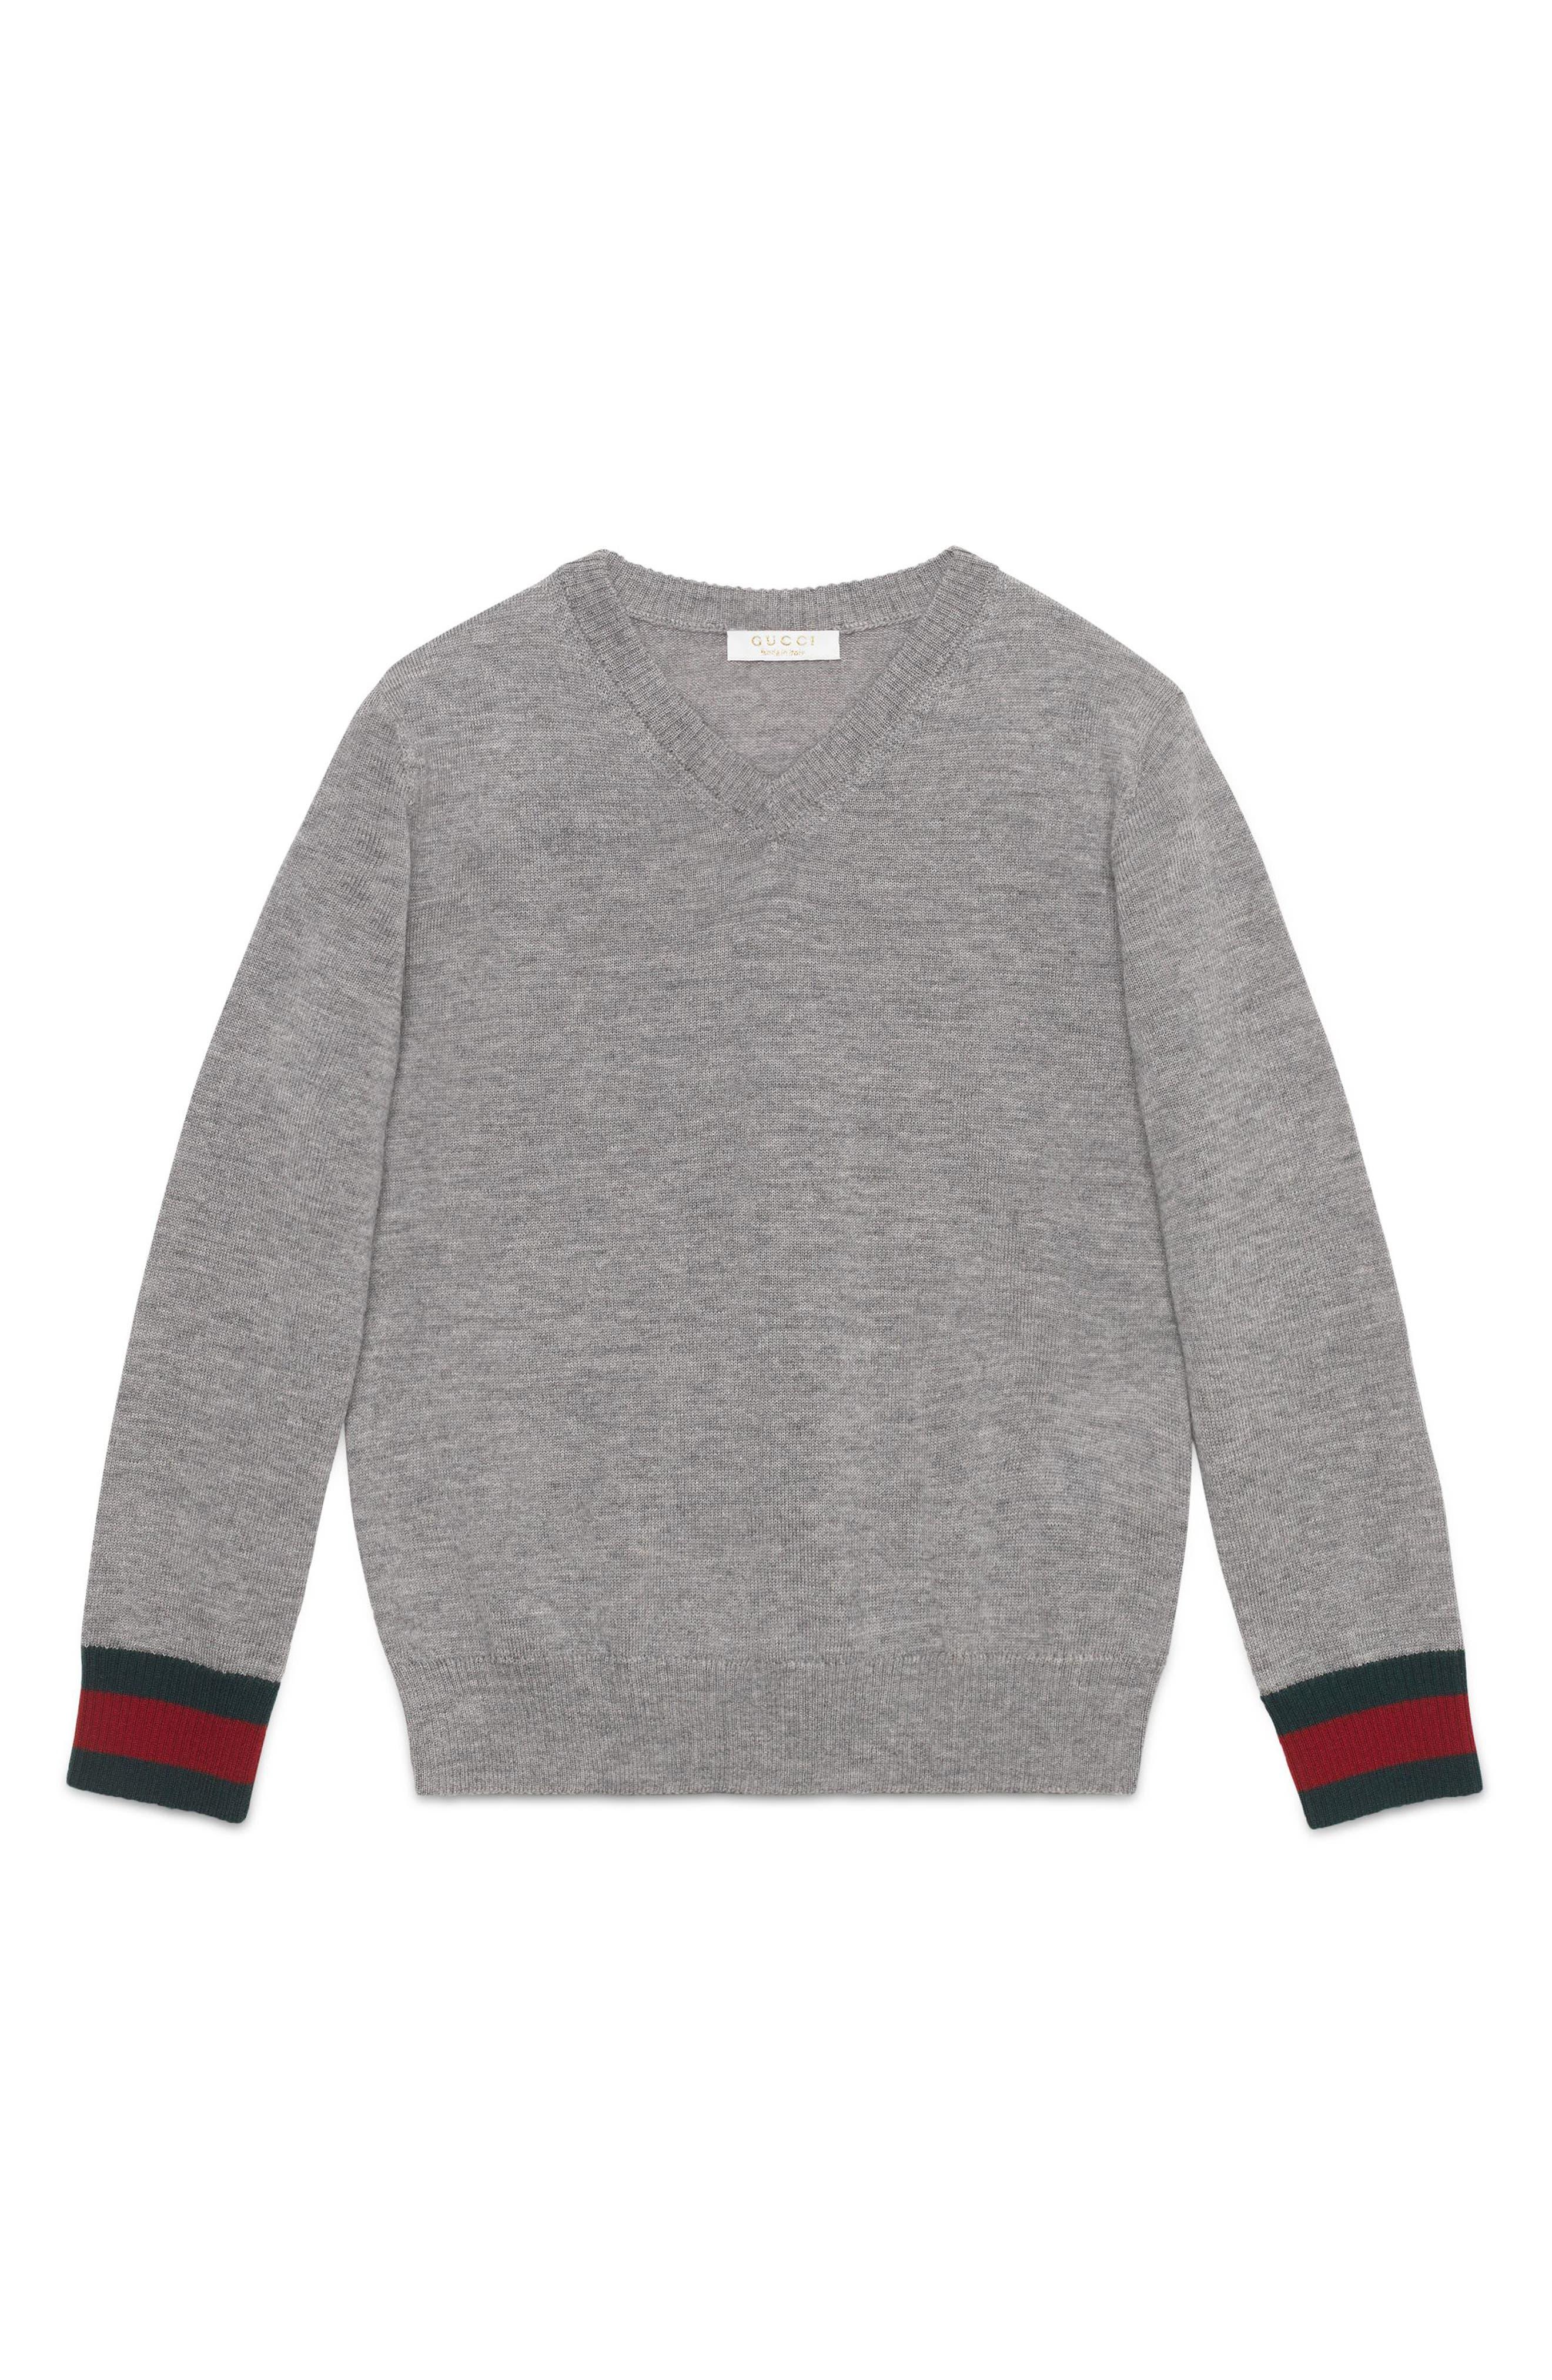 Stripe Cuff V-Neck Merino Wool Sweater,                             Alternate thumbnail 2, color,                             GREY MULTI